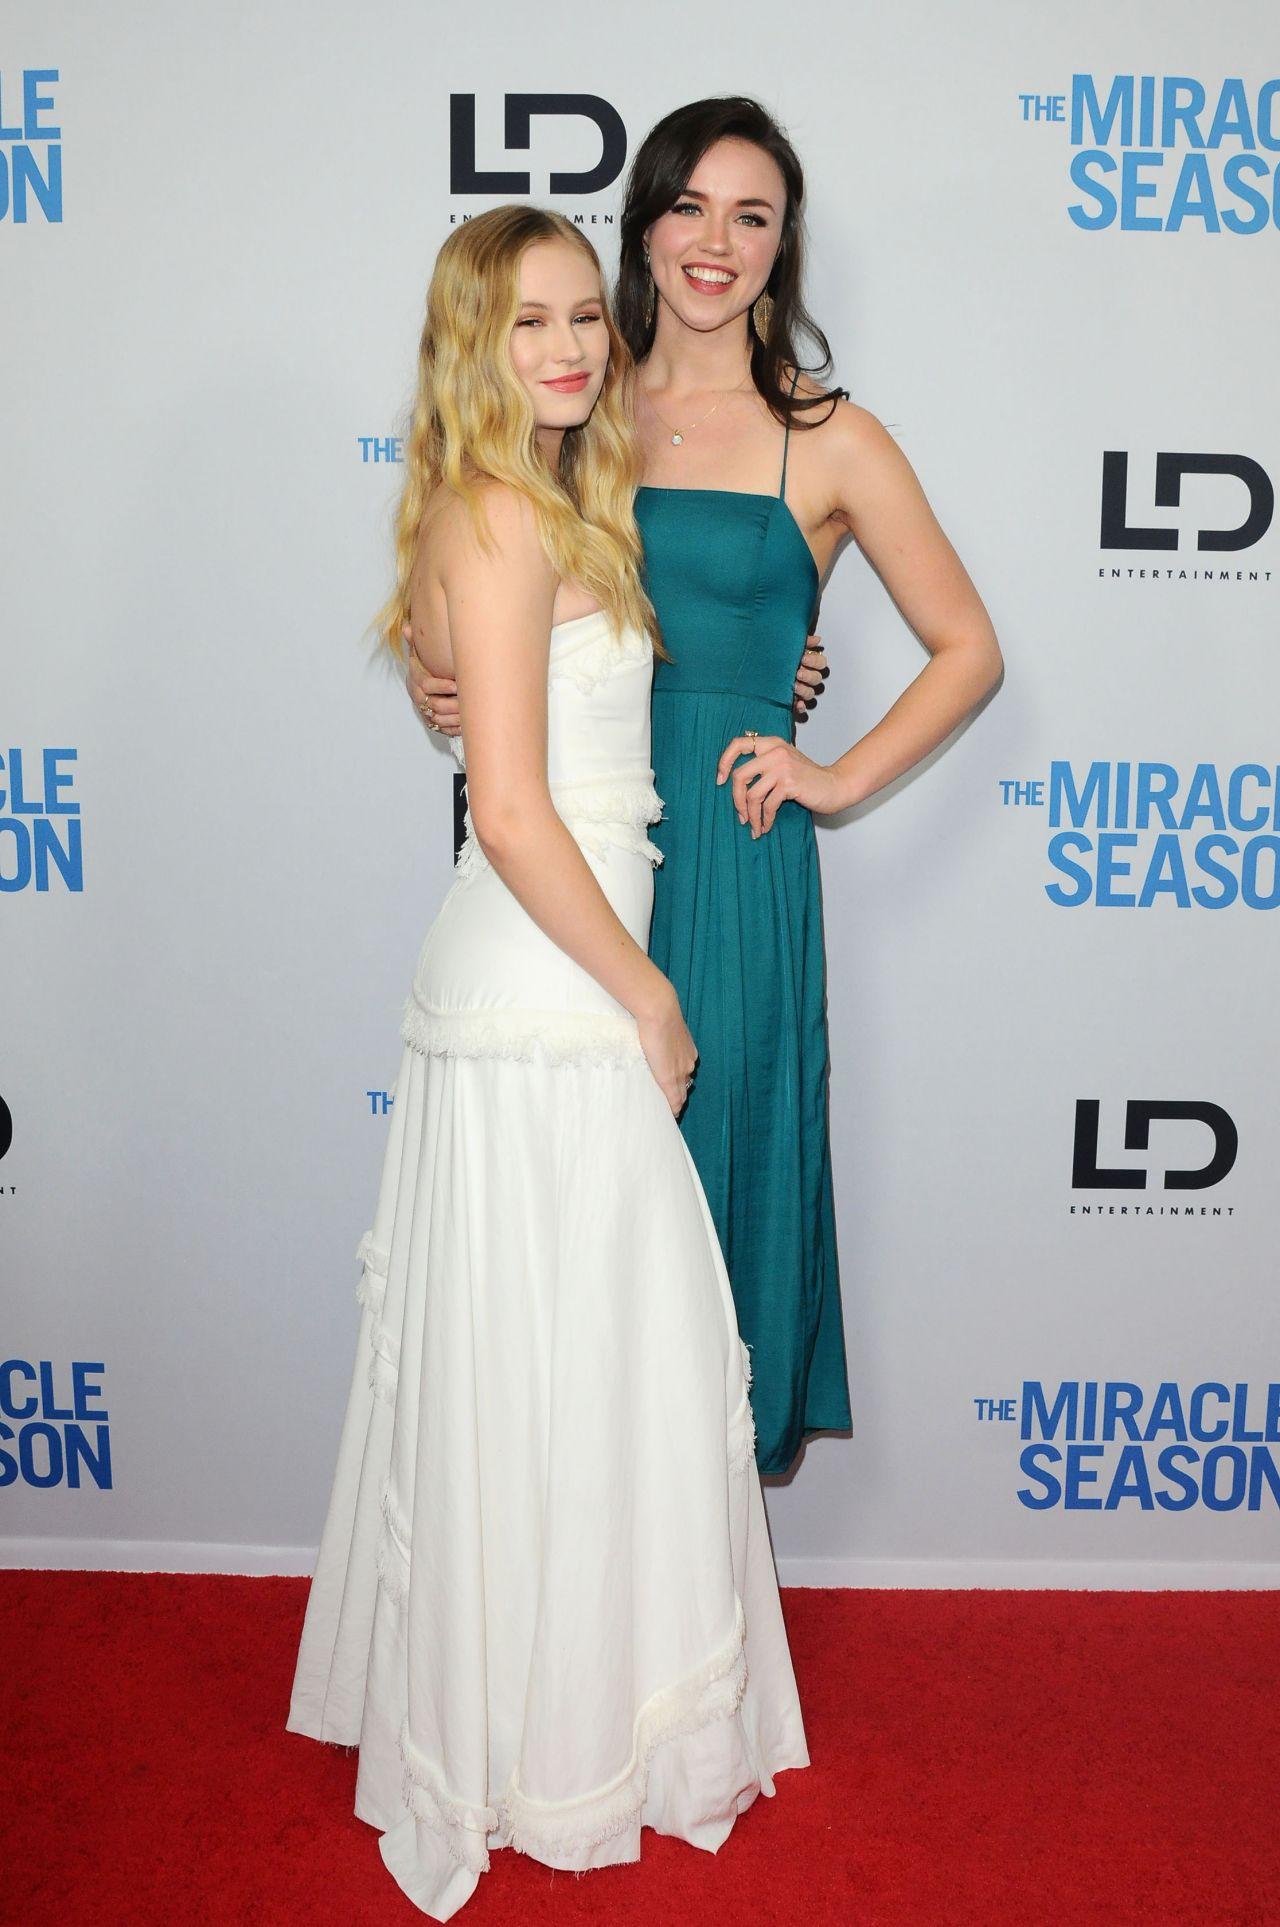 Danika Yarosh The Miracle Season Special Screening In